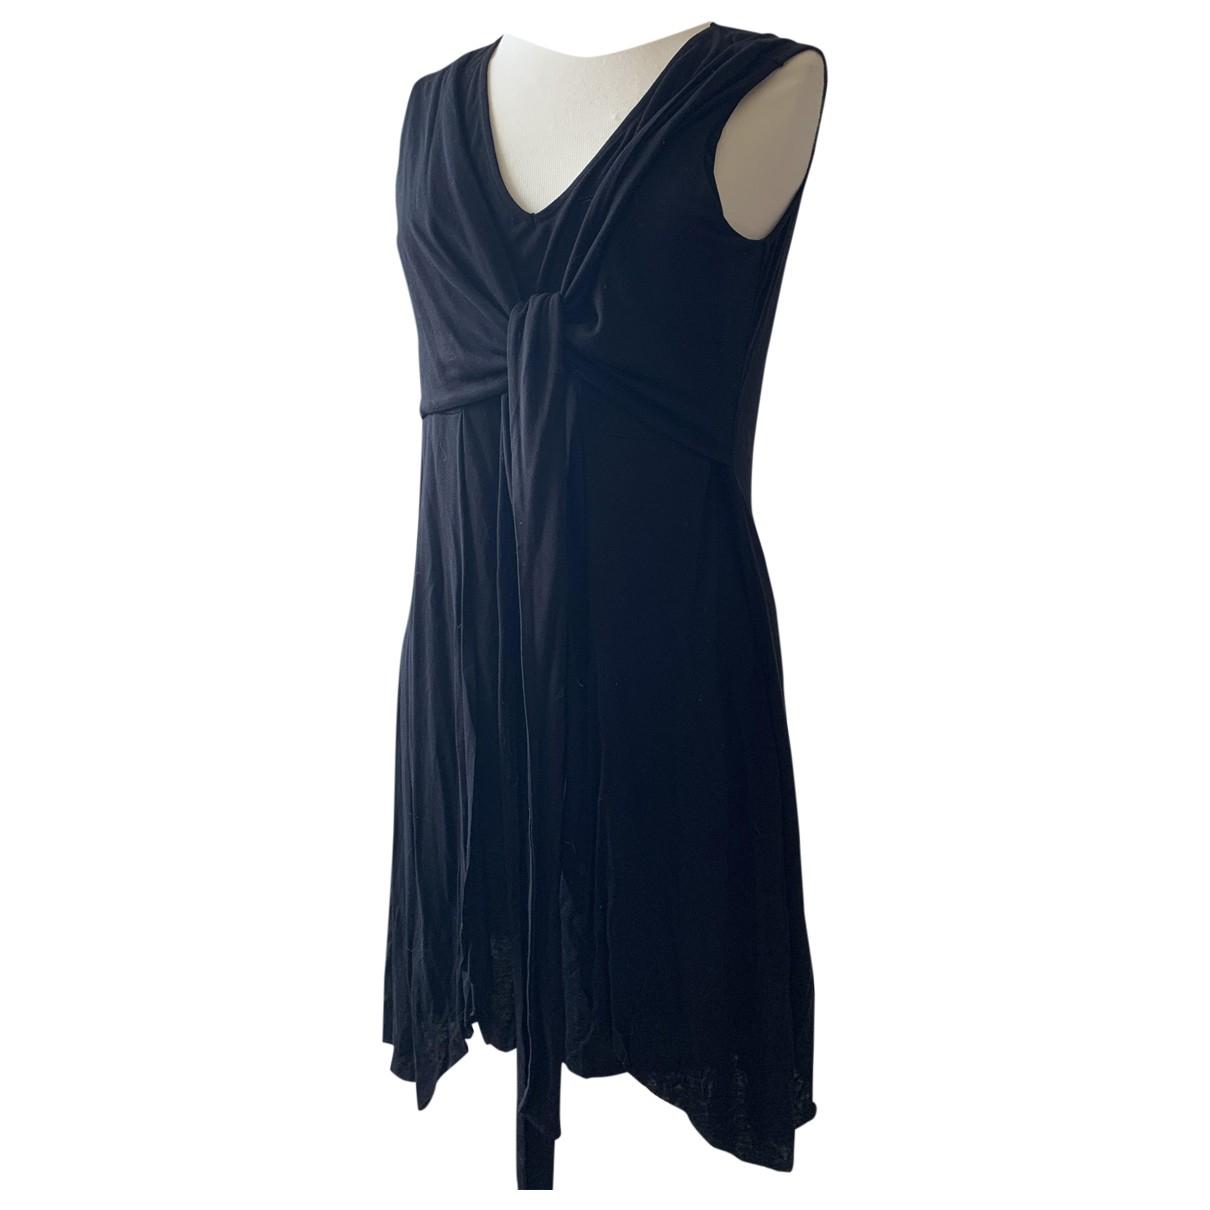 All Saints \N Black dress for Women M International